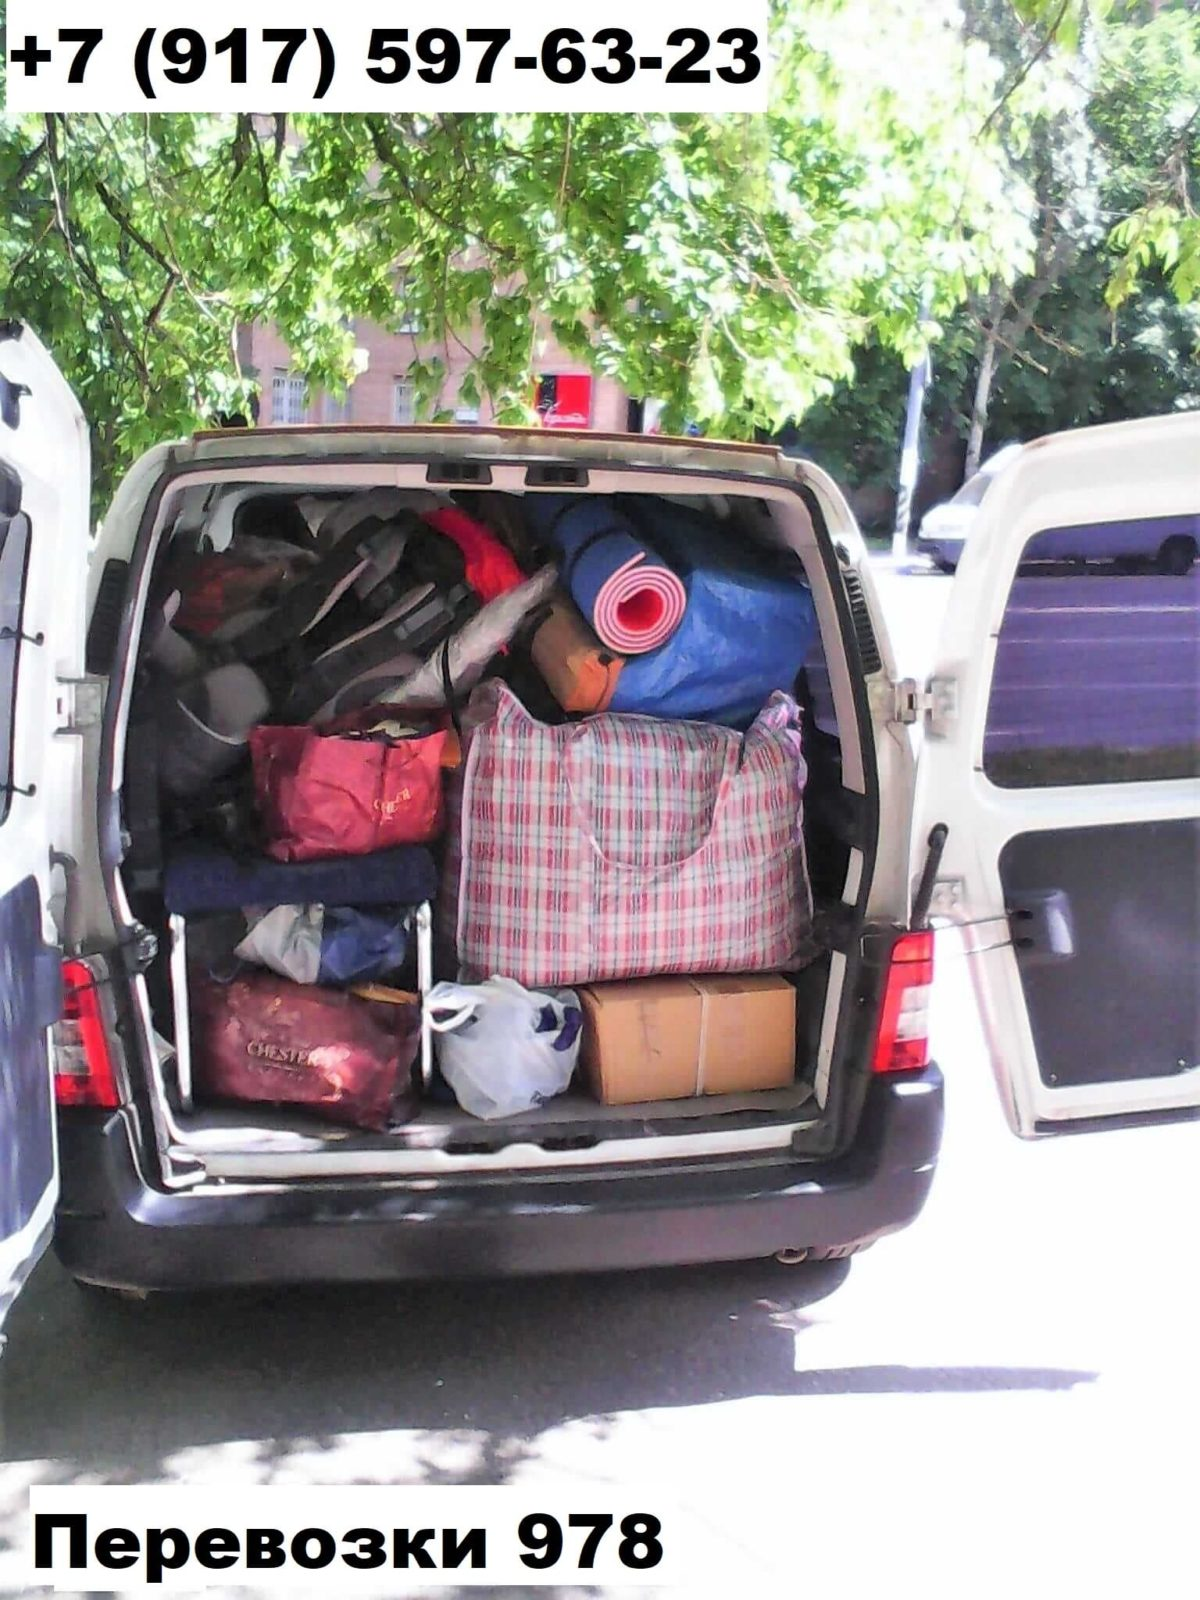 Квартирный переезд Москва - недорого | Тонна-СВ